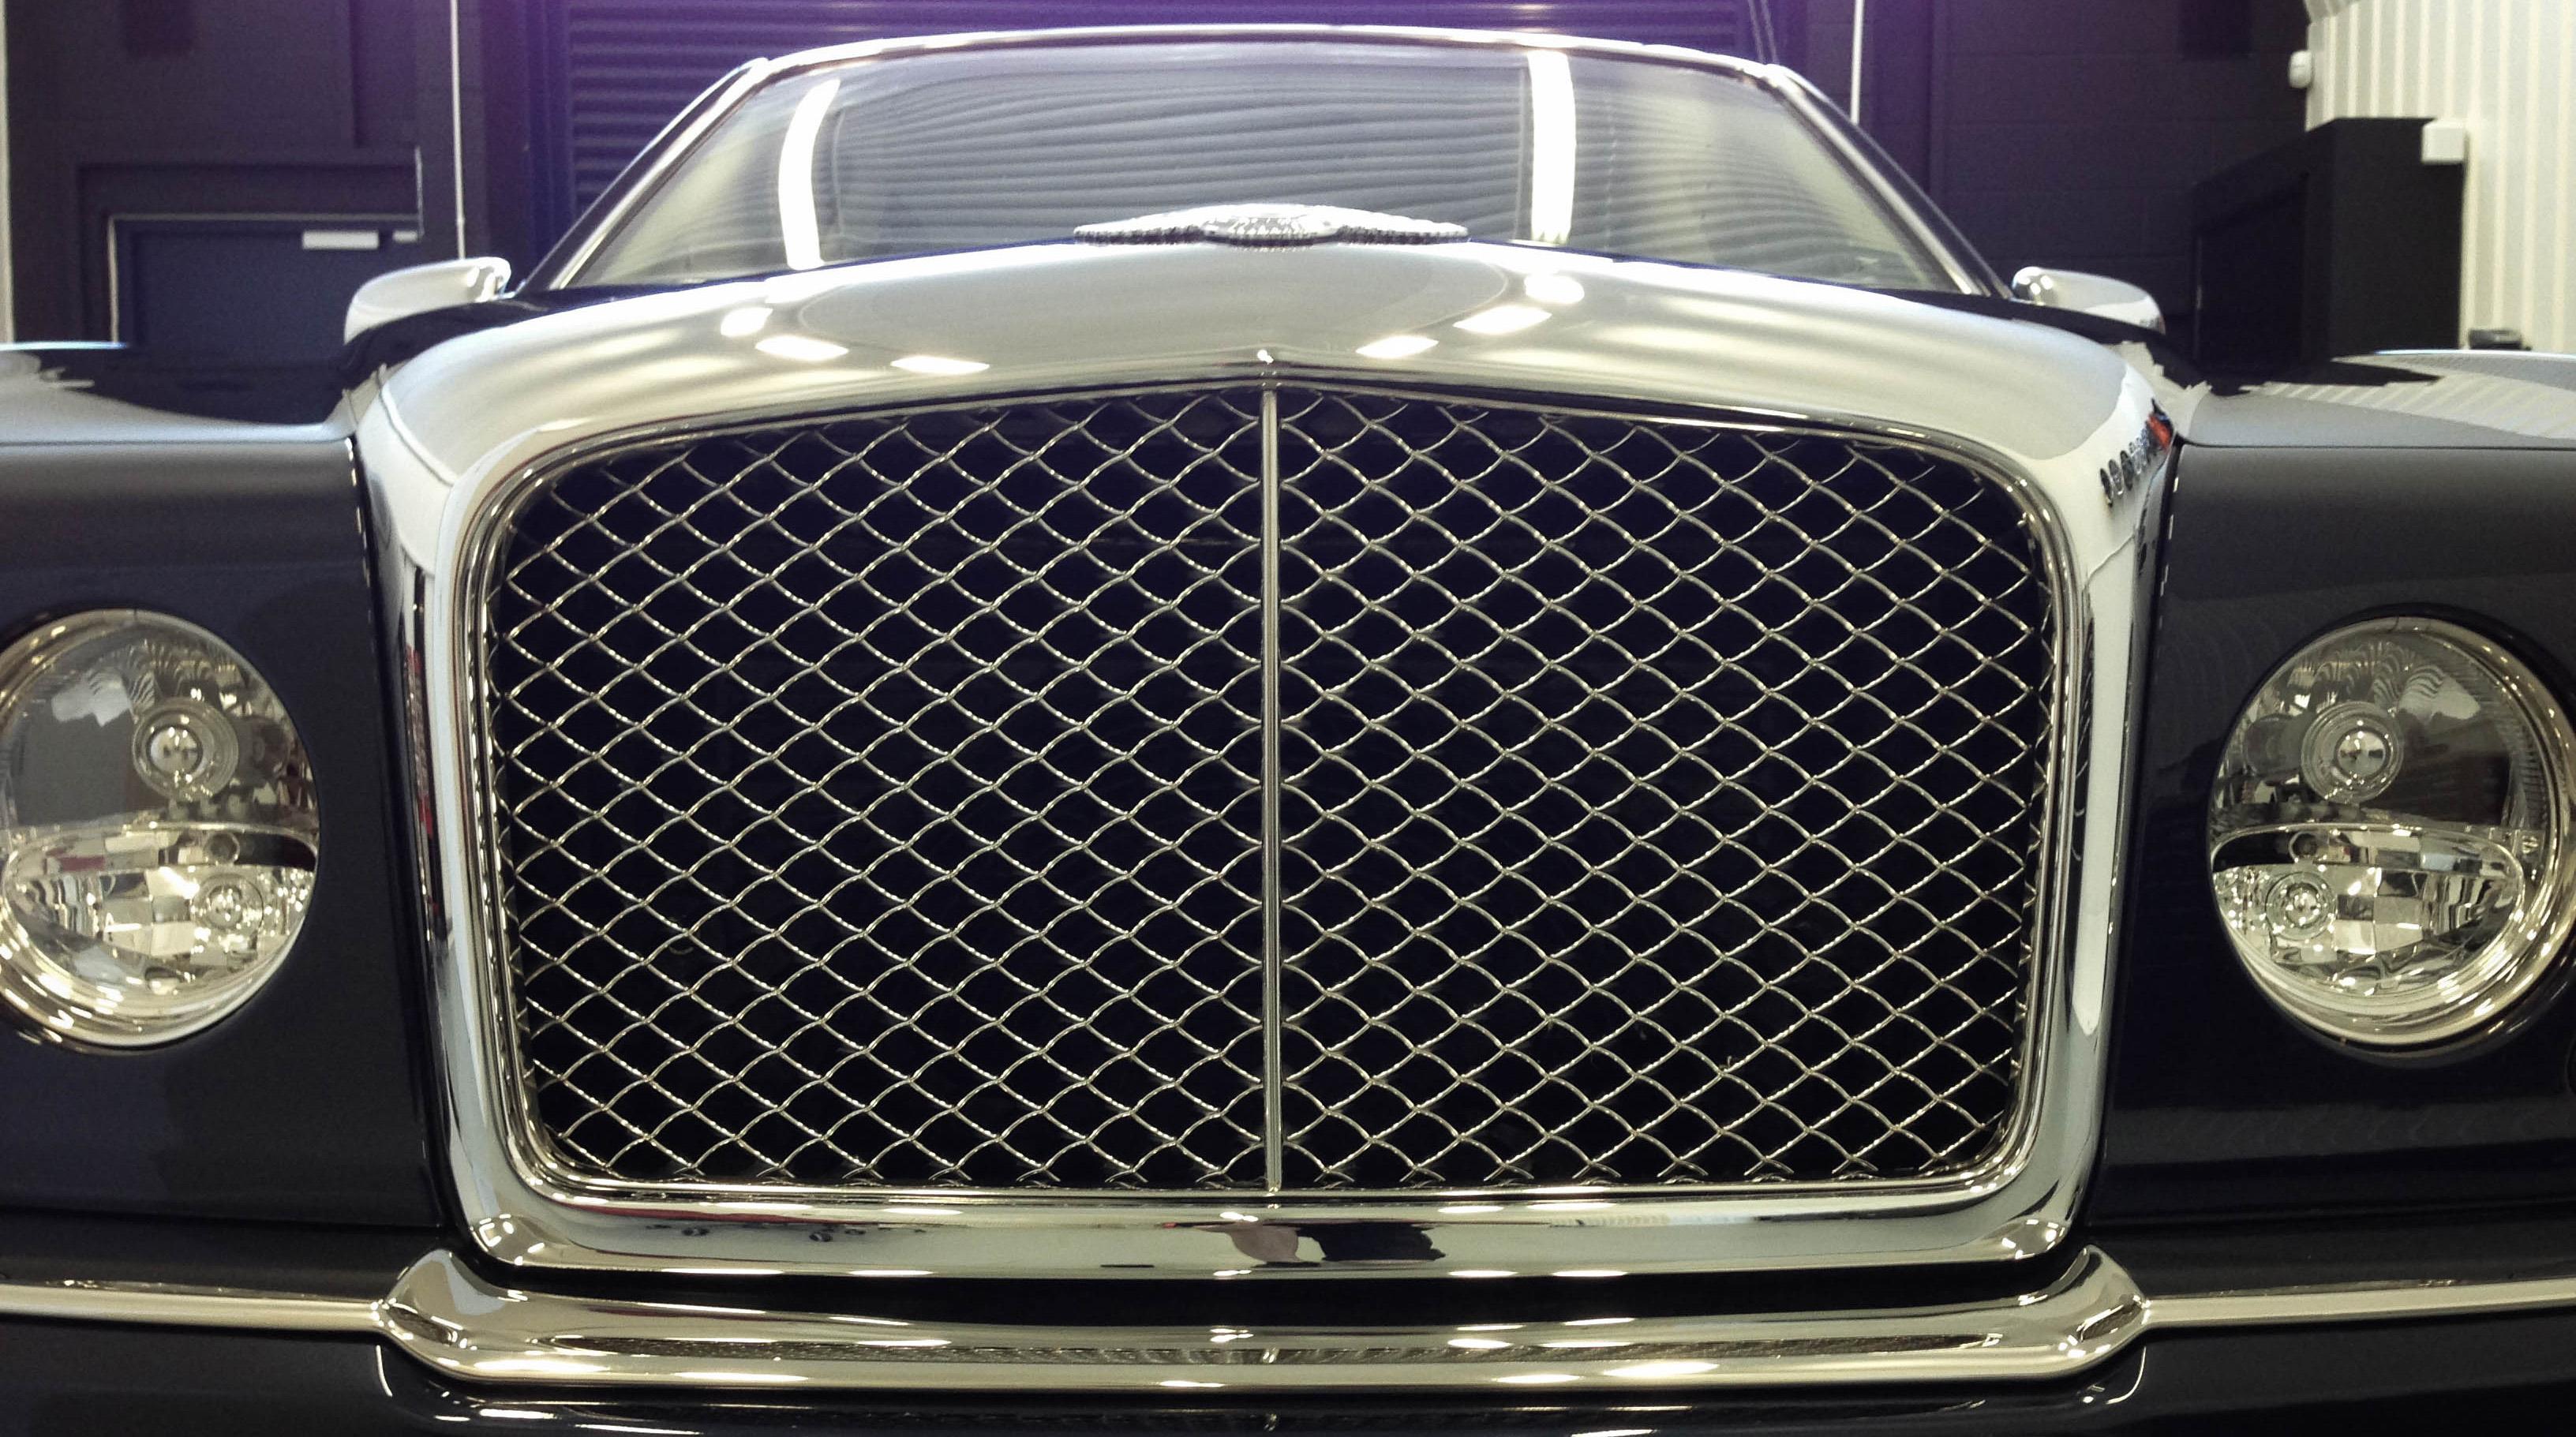 Bentley Arnage – Grill